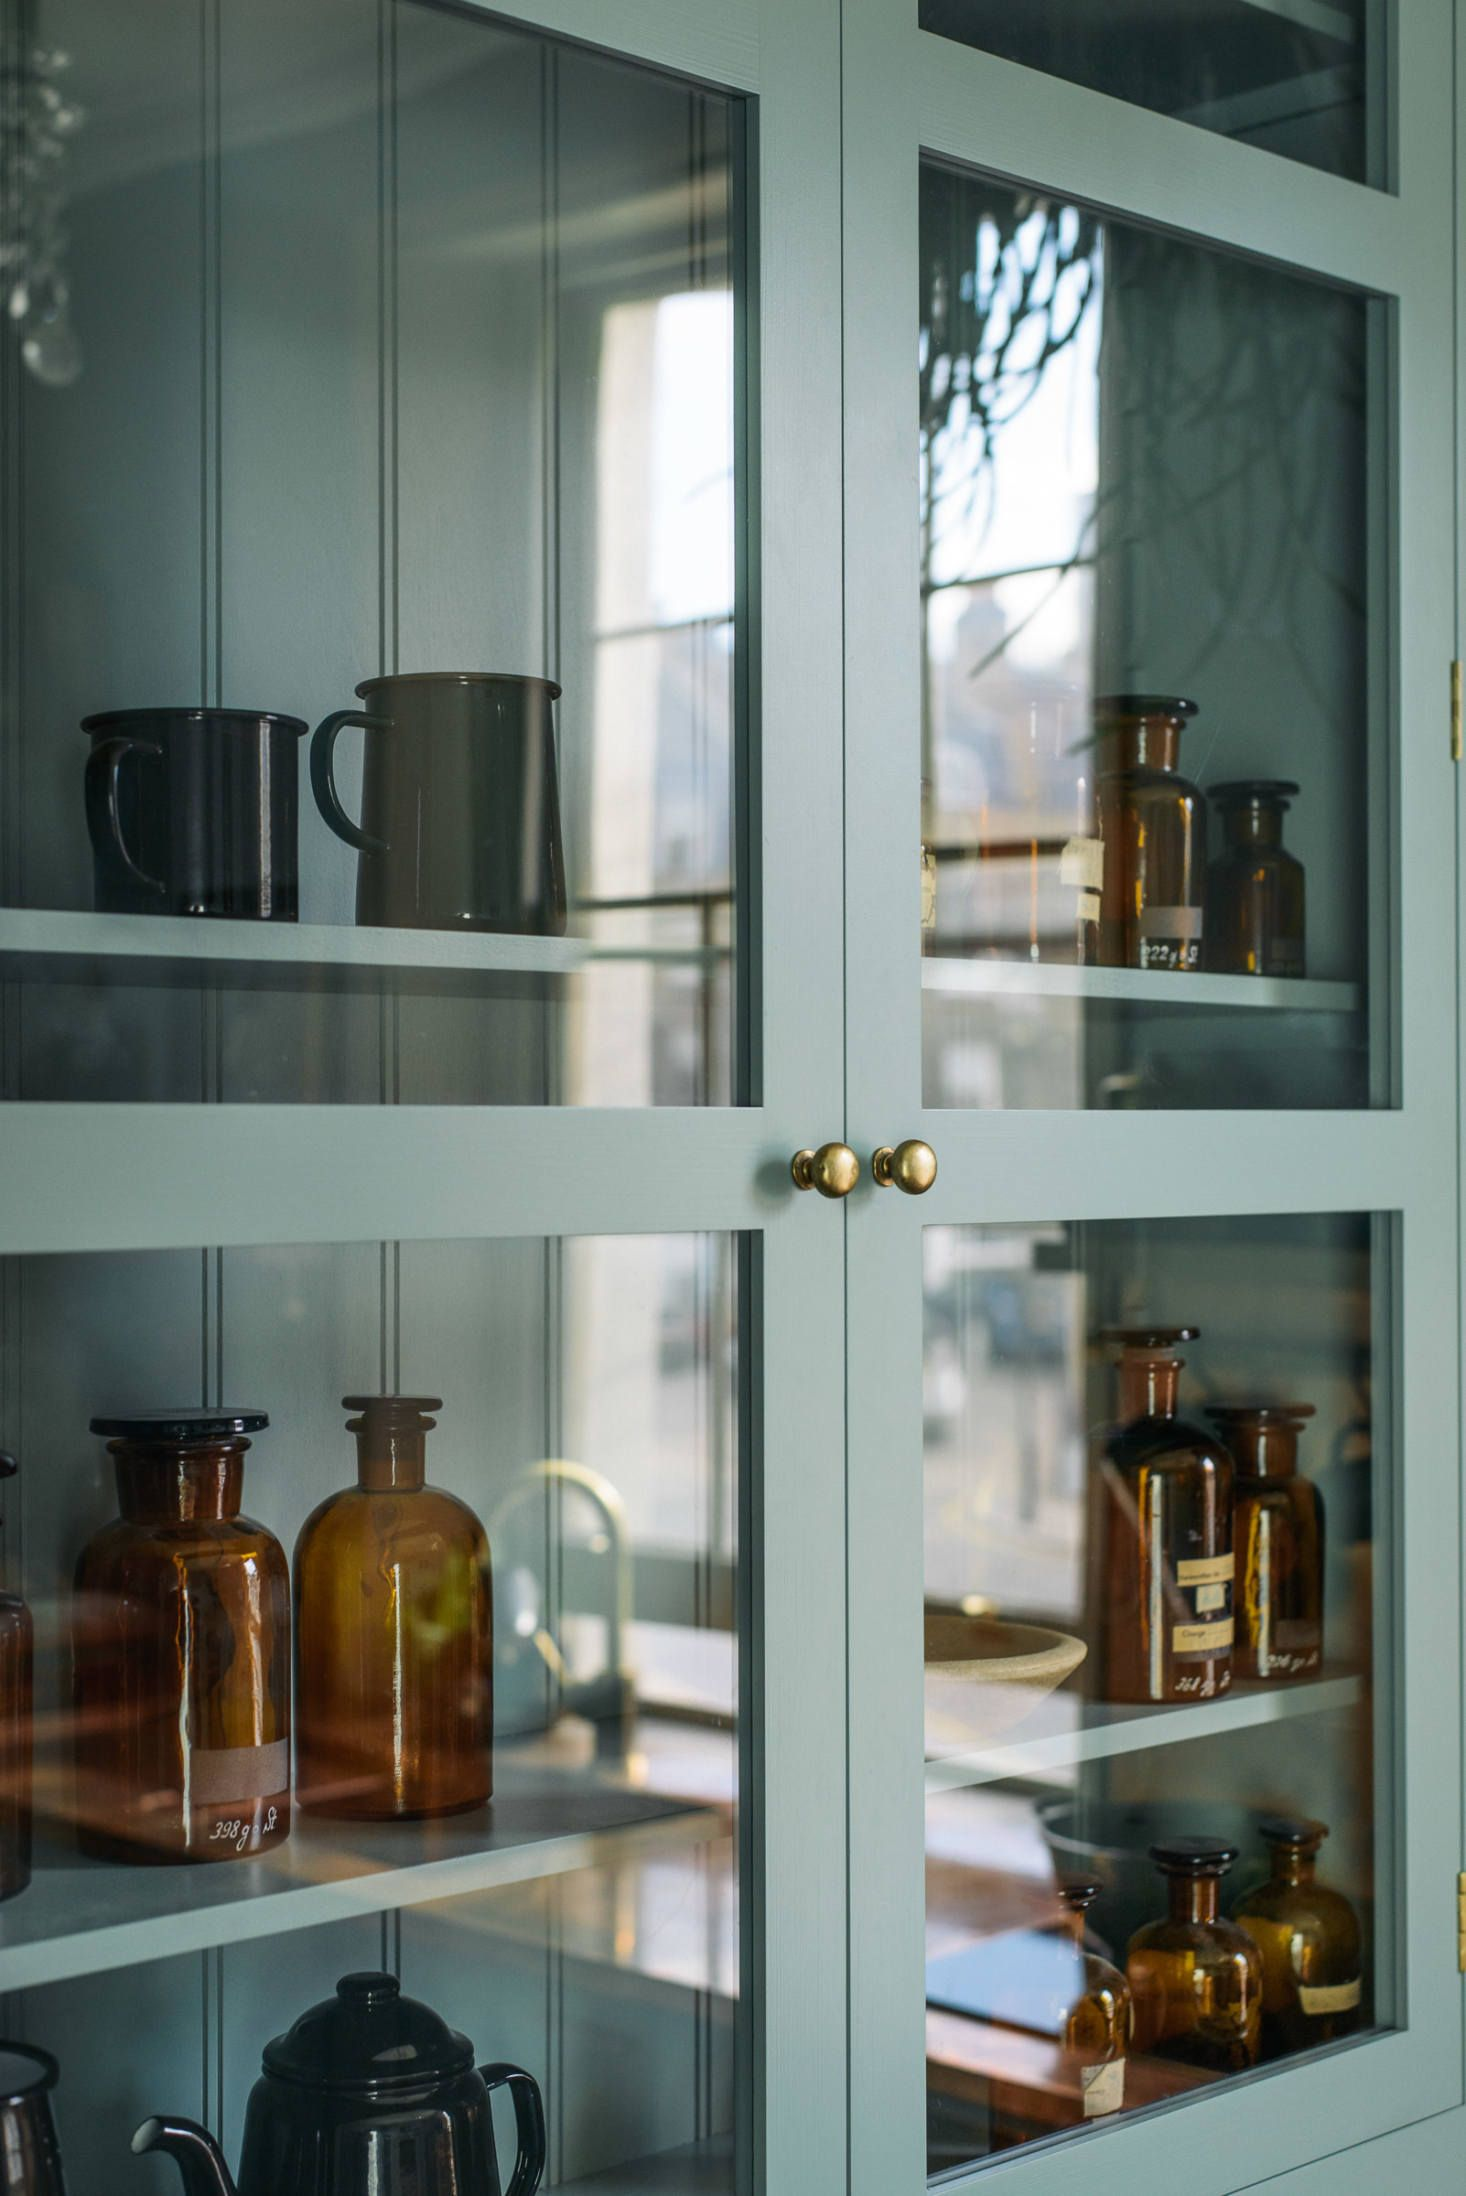 Kitchen of the Week: deVol\'s Urban Rustic Kitchen Gets a Glamorous ...